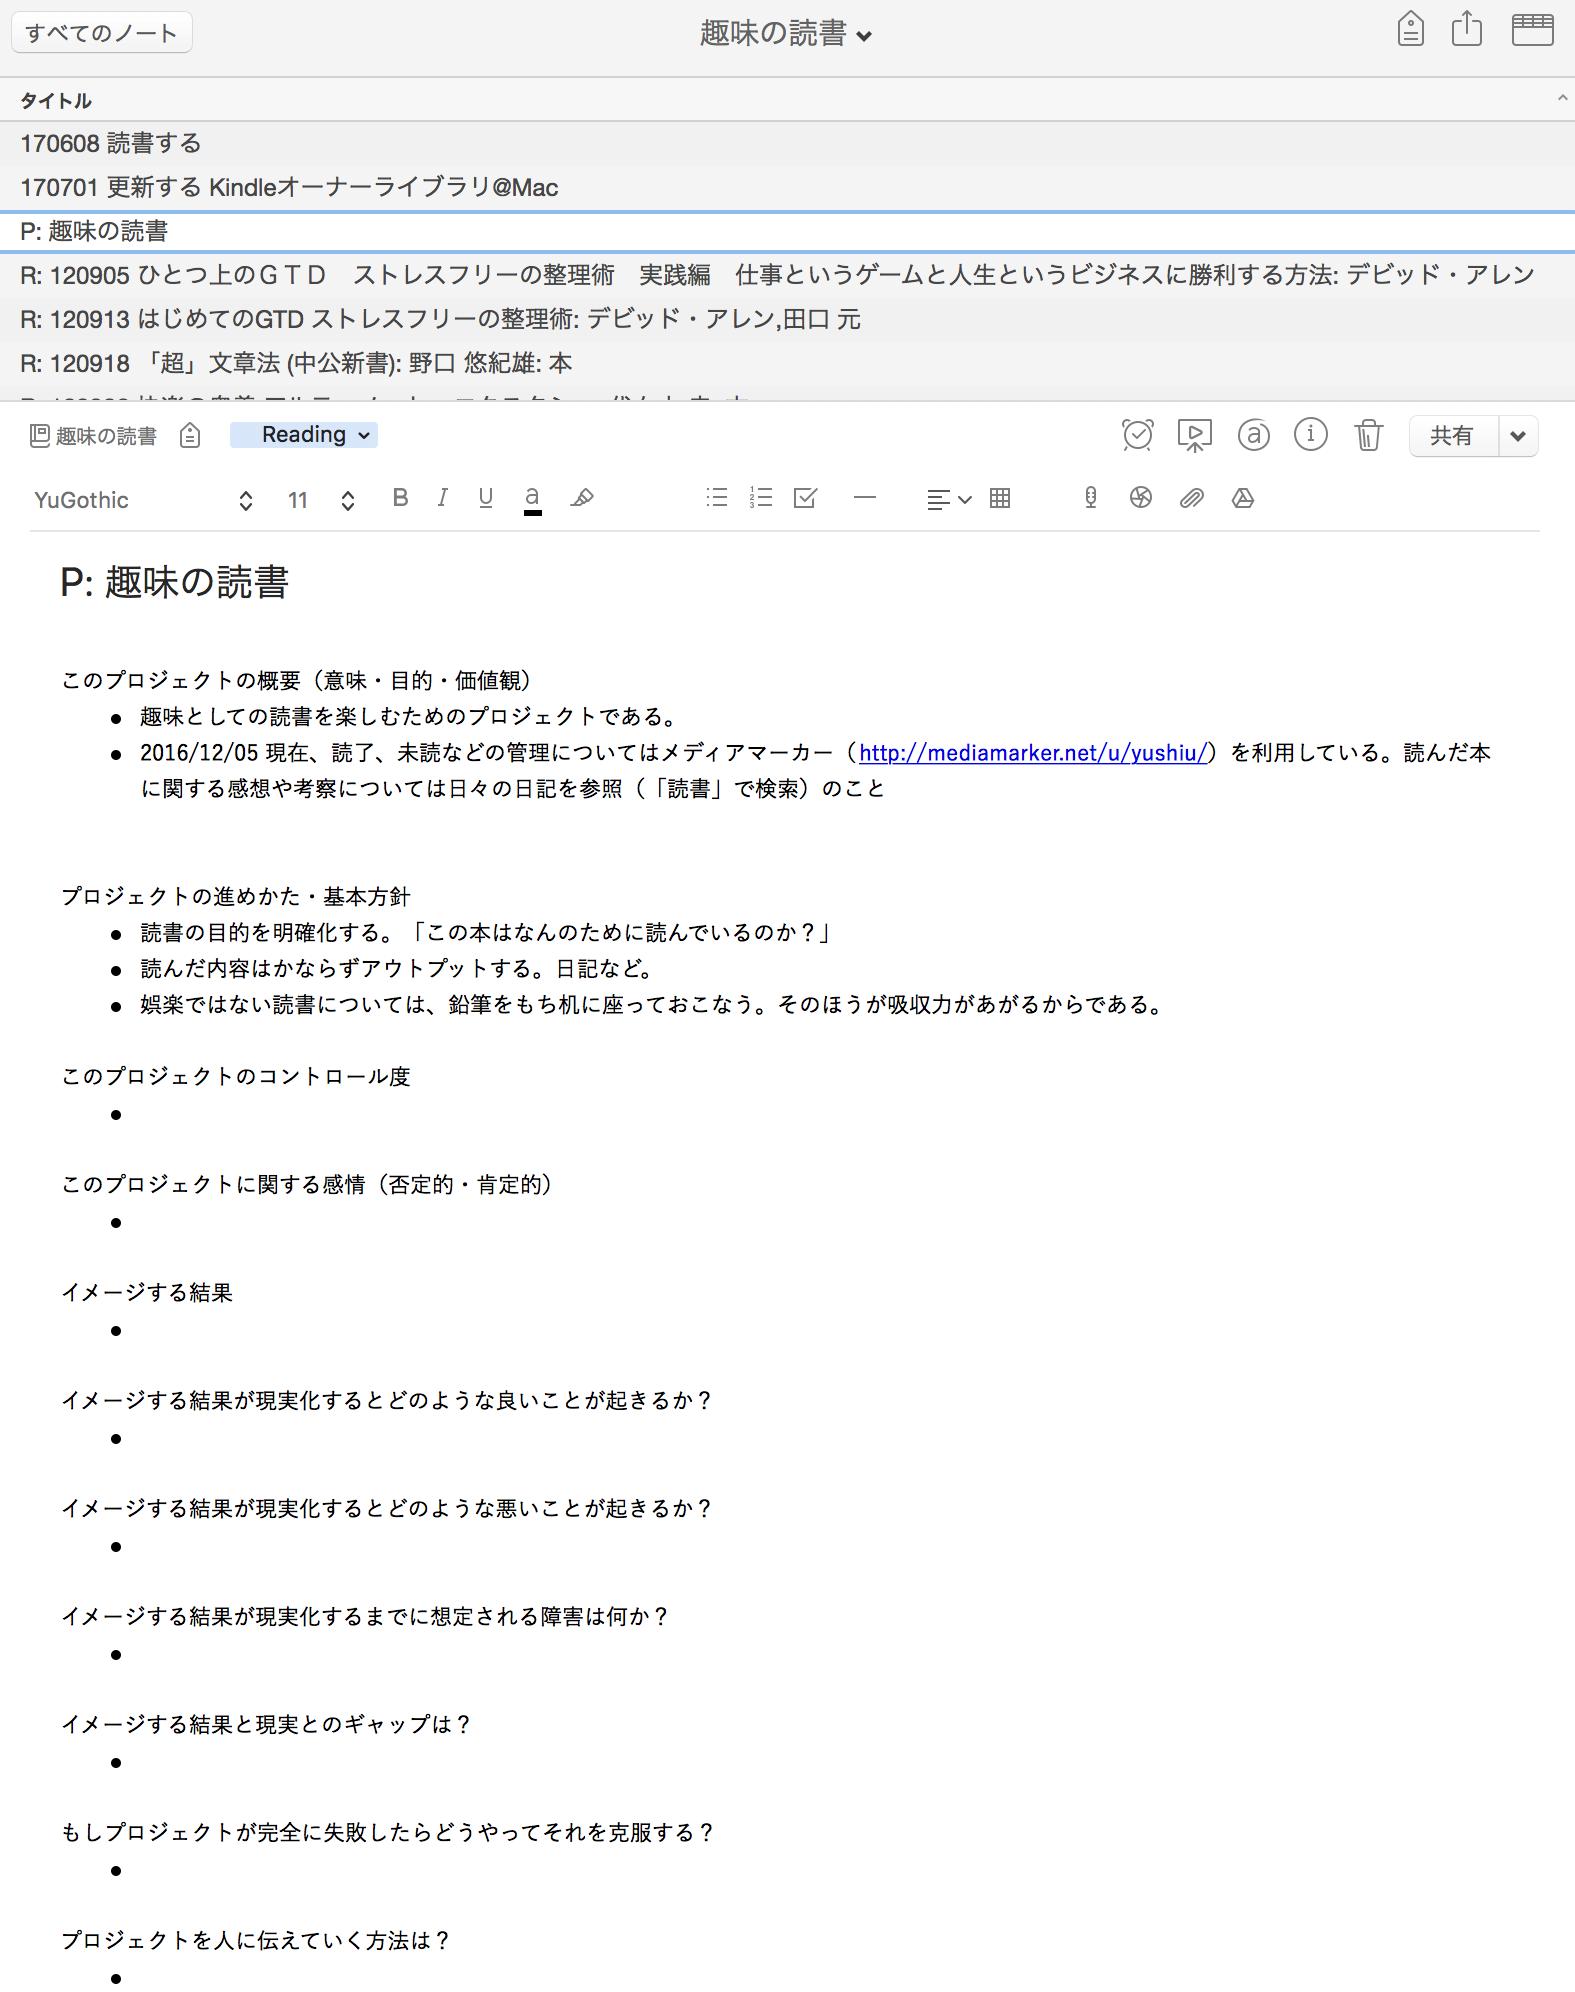 Evernote を利用したプロジェクトの計画作成